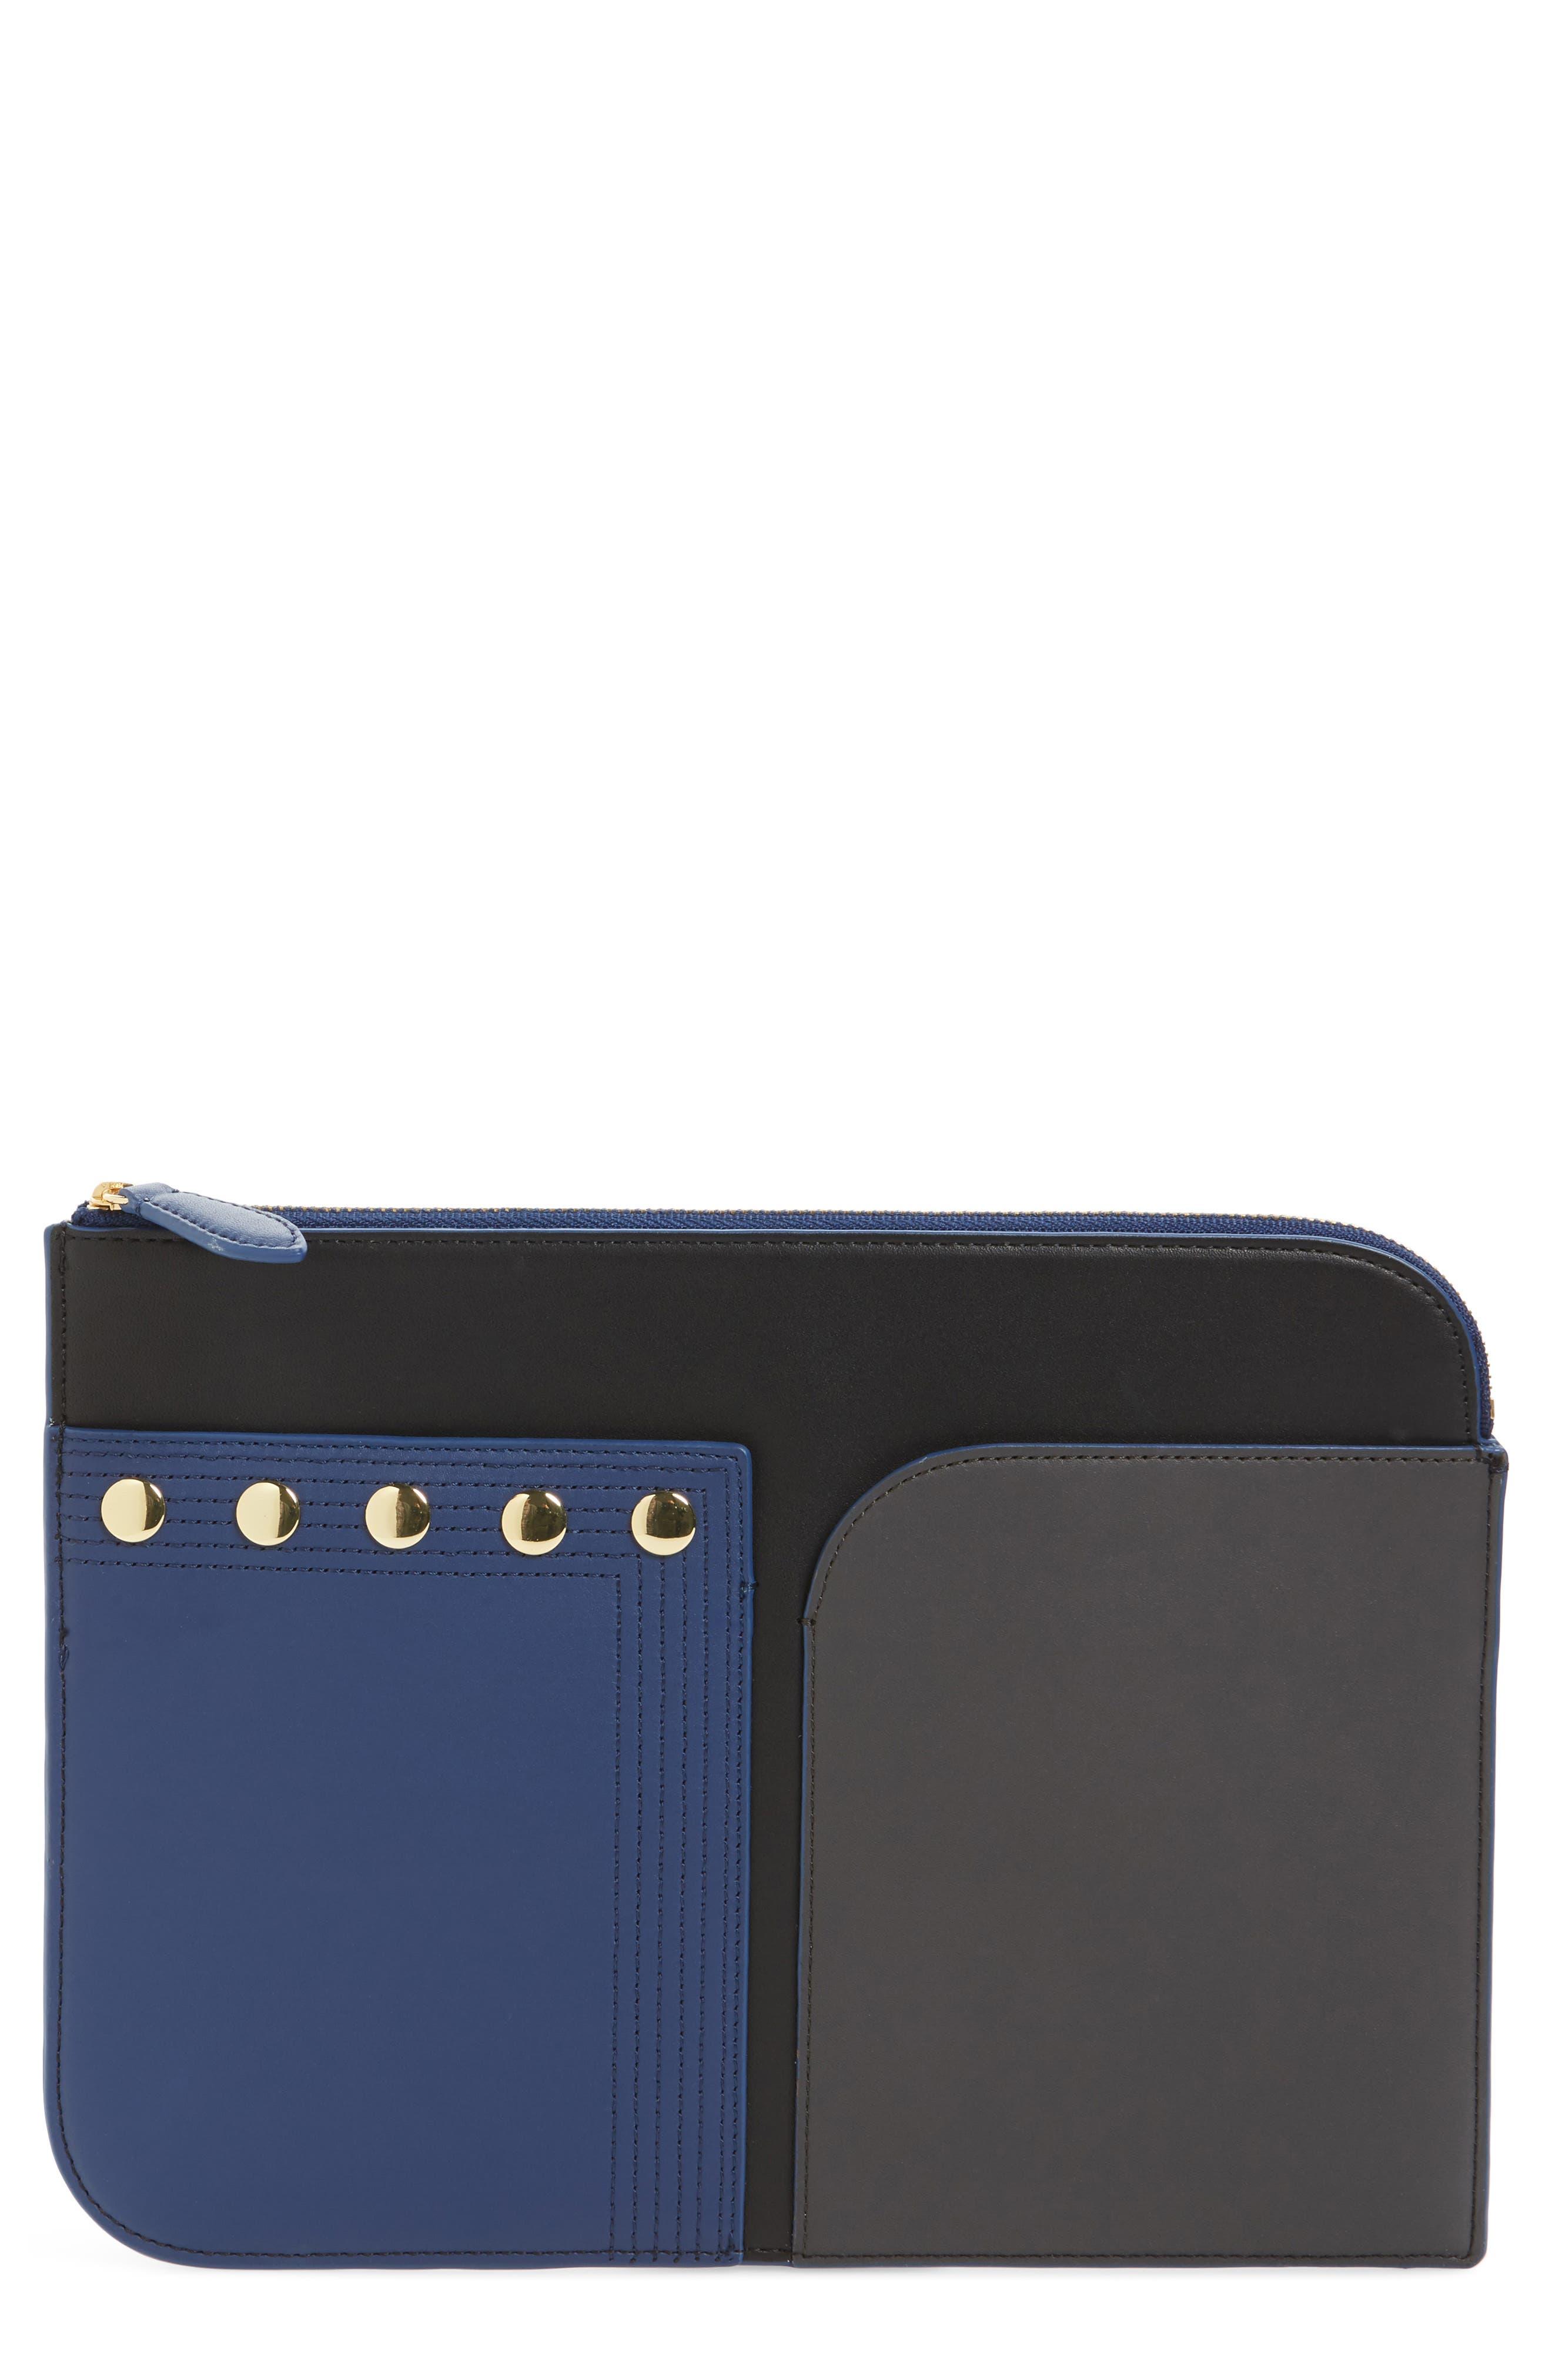 Large Colorblock Leather Zip Pouch,                             Main thumbnail 1, color,                             402